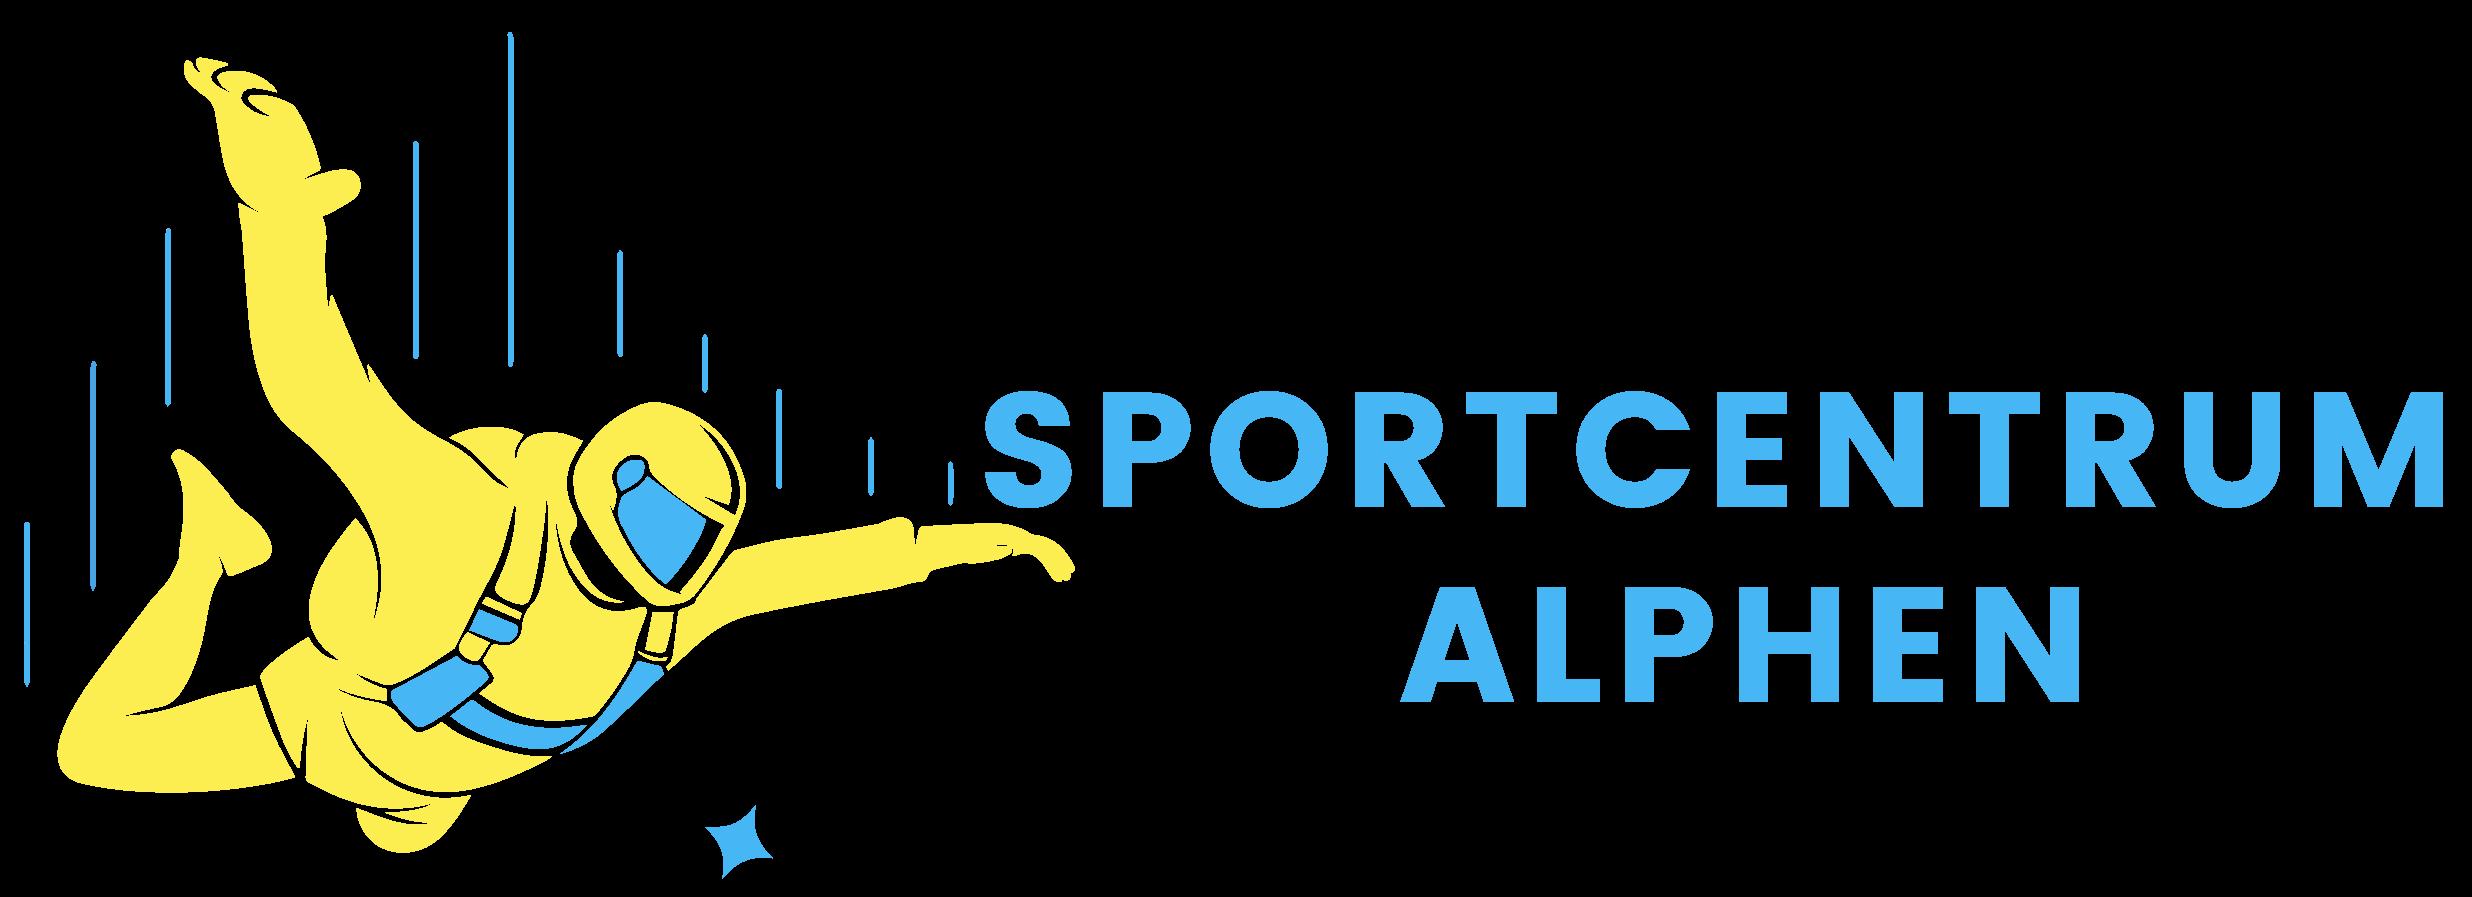 Sportcentrum Alphen